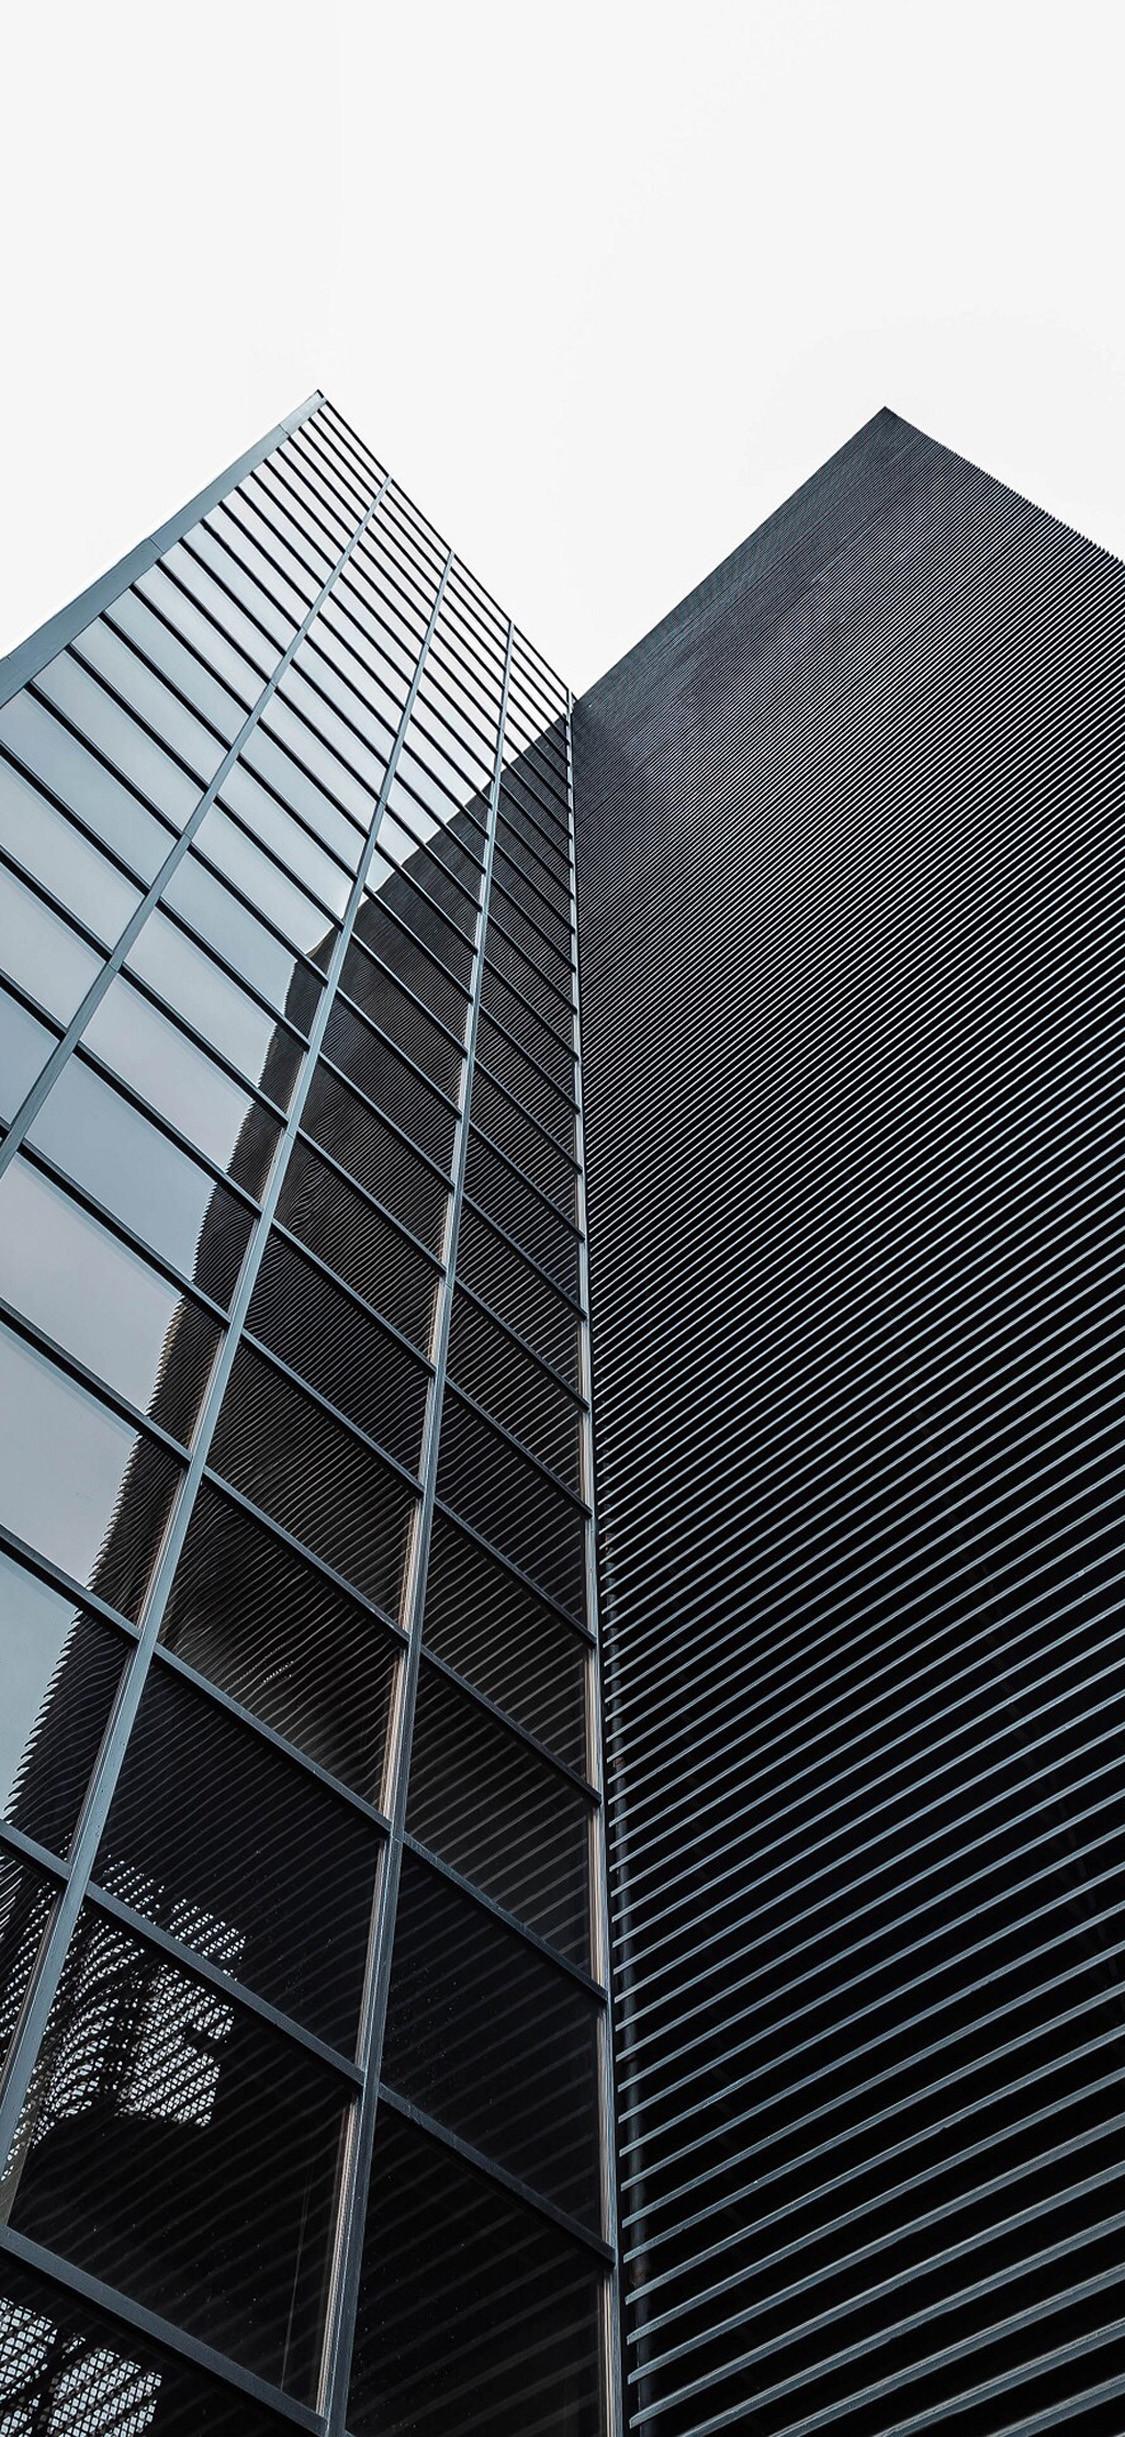 Perspective Wallpaper Iphone - Building , HD Wallpaper & Backgrounds